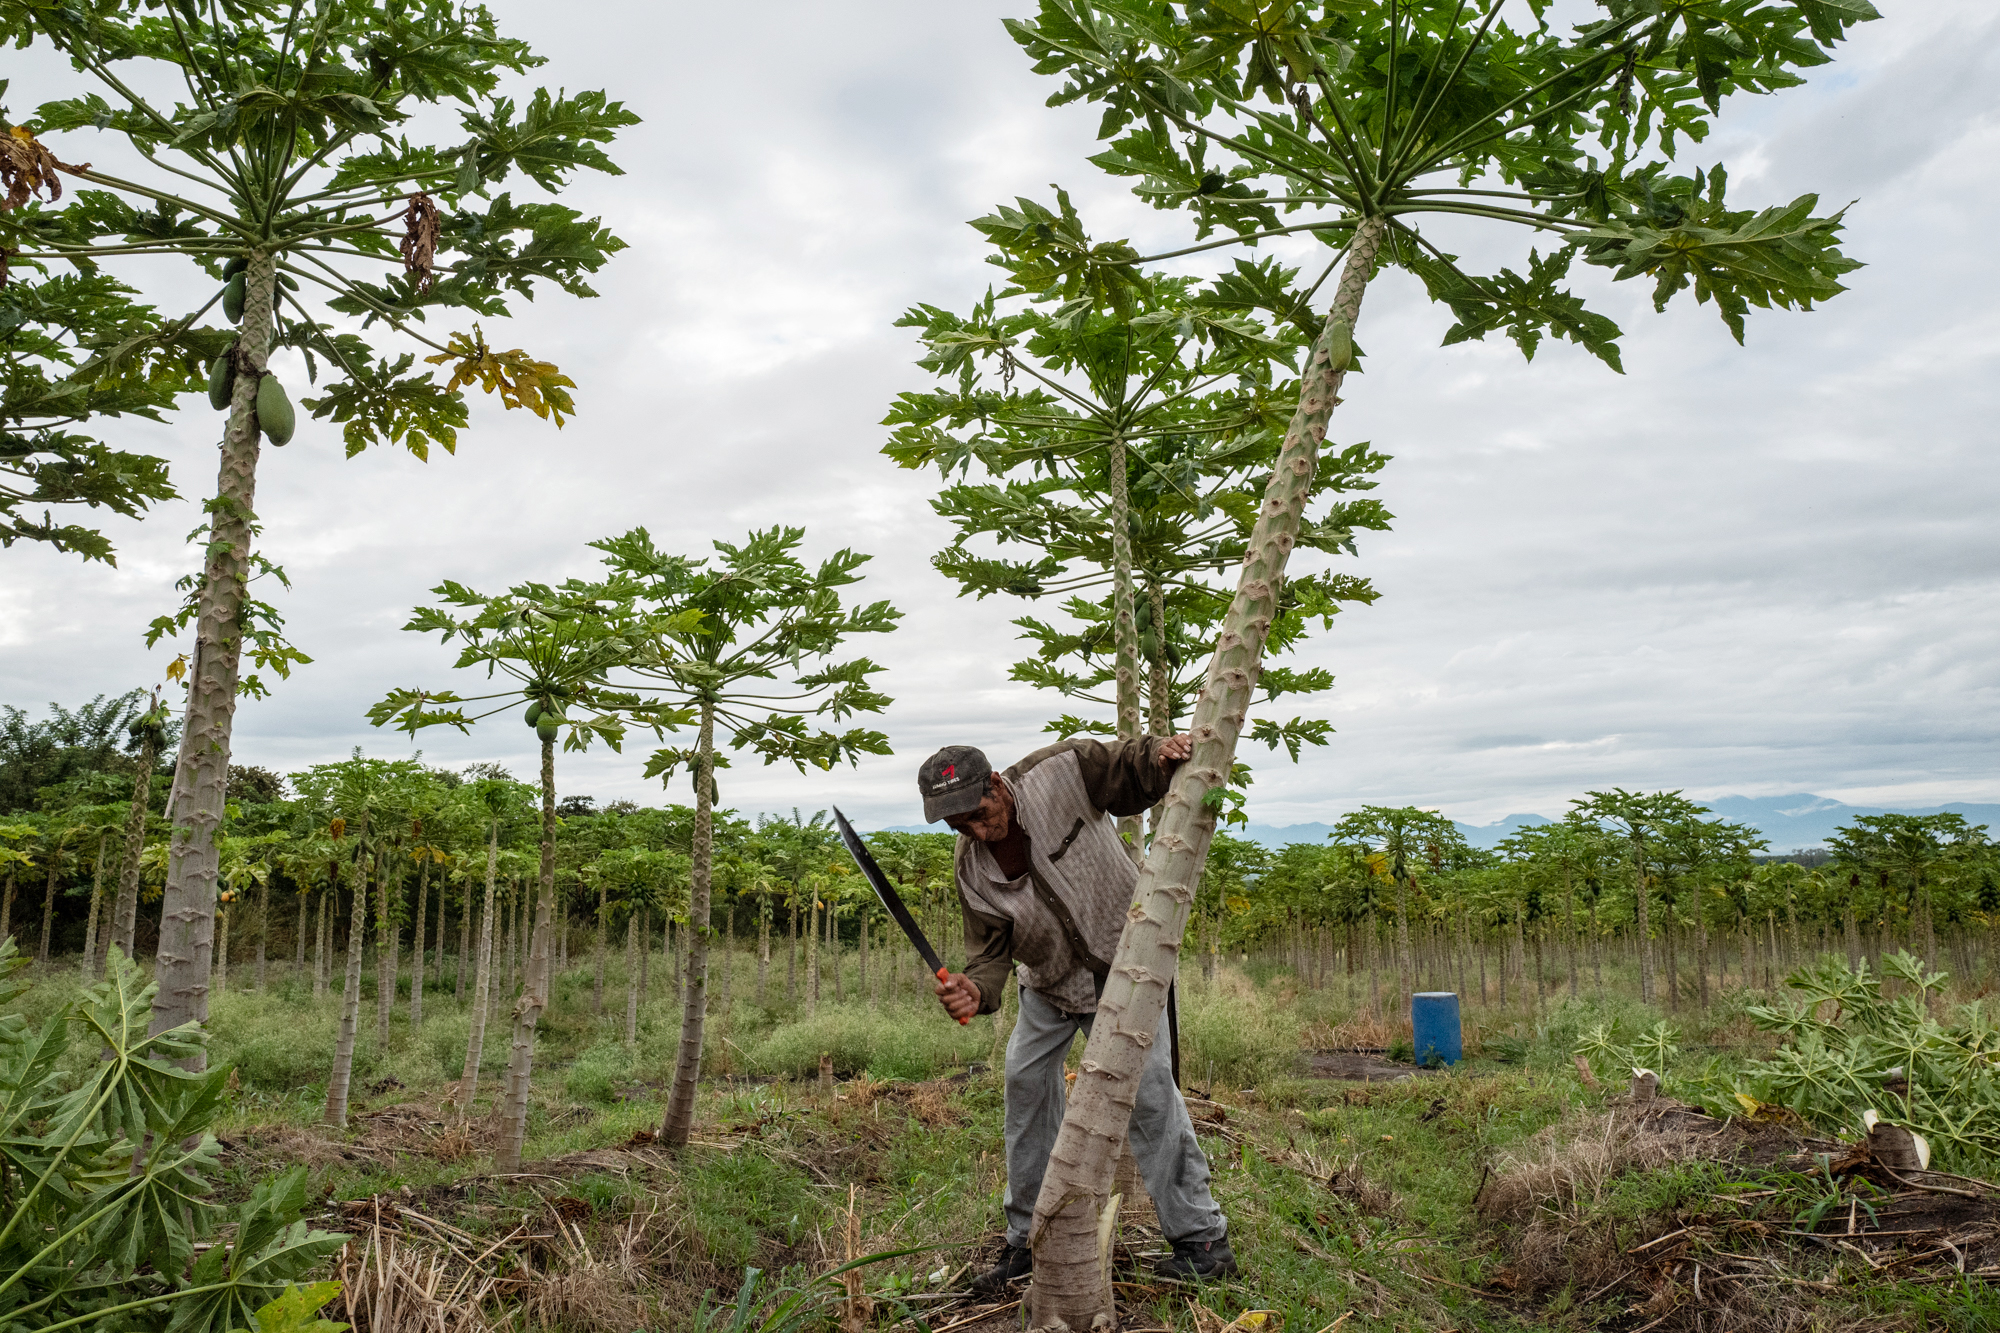 Jair Triviño cuts down a papaya tree in Ricaurte, Valle del Cauca on July 30, 2018.